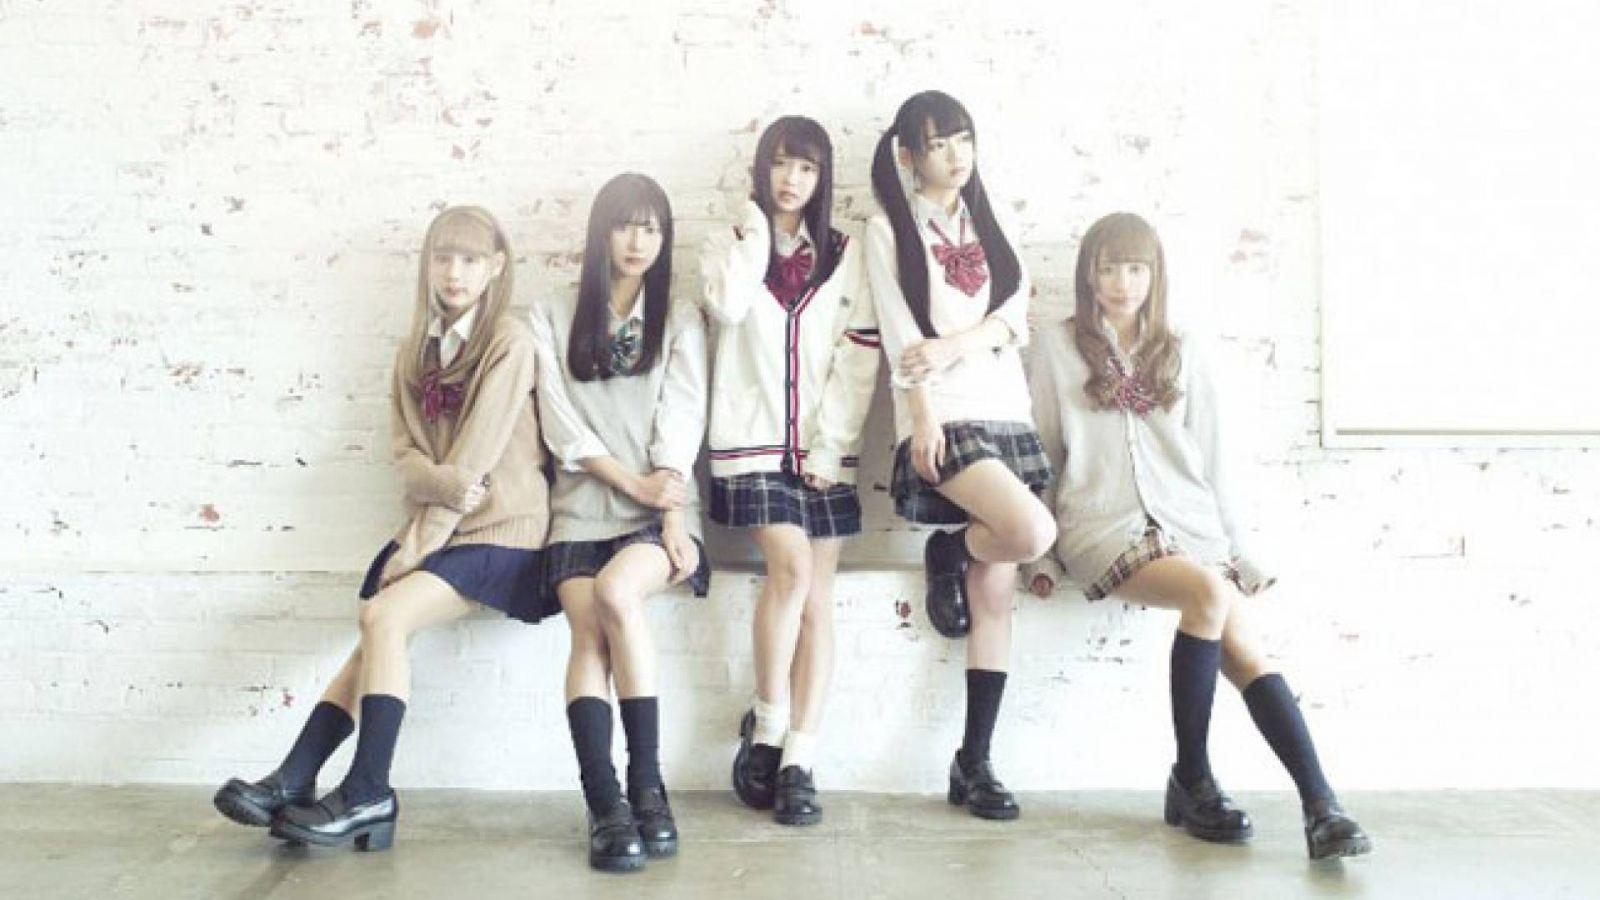 2o Love to Sweet Bullet © sun-krad Co., Ltd. / Millennium Japan, provided by Gan-Shin Records